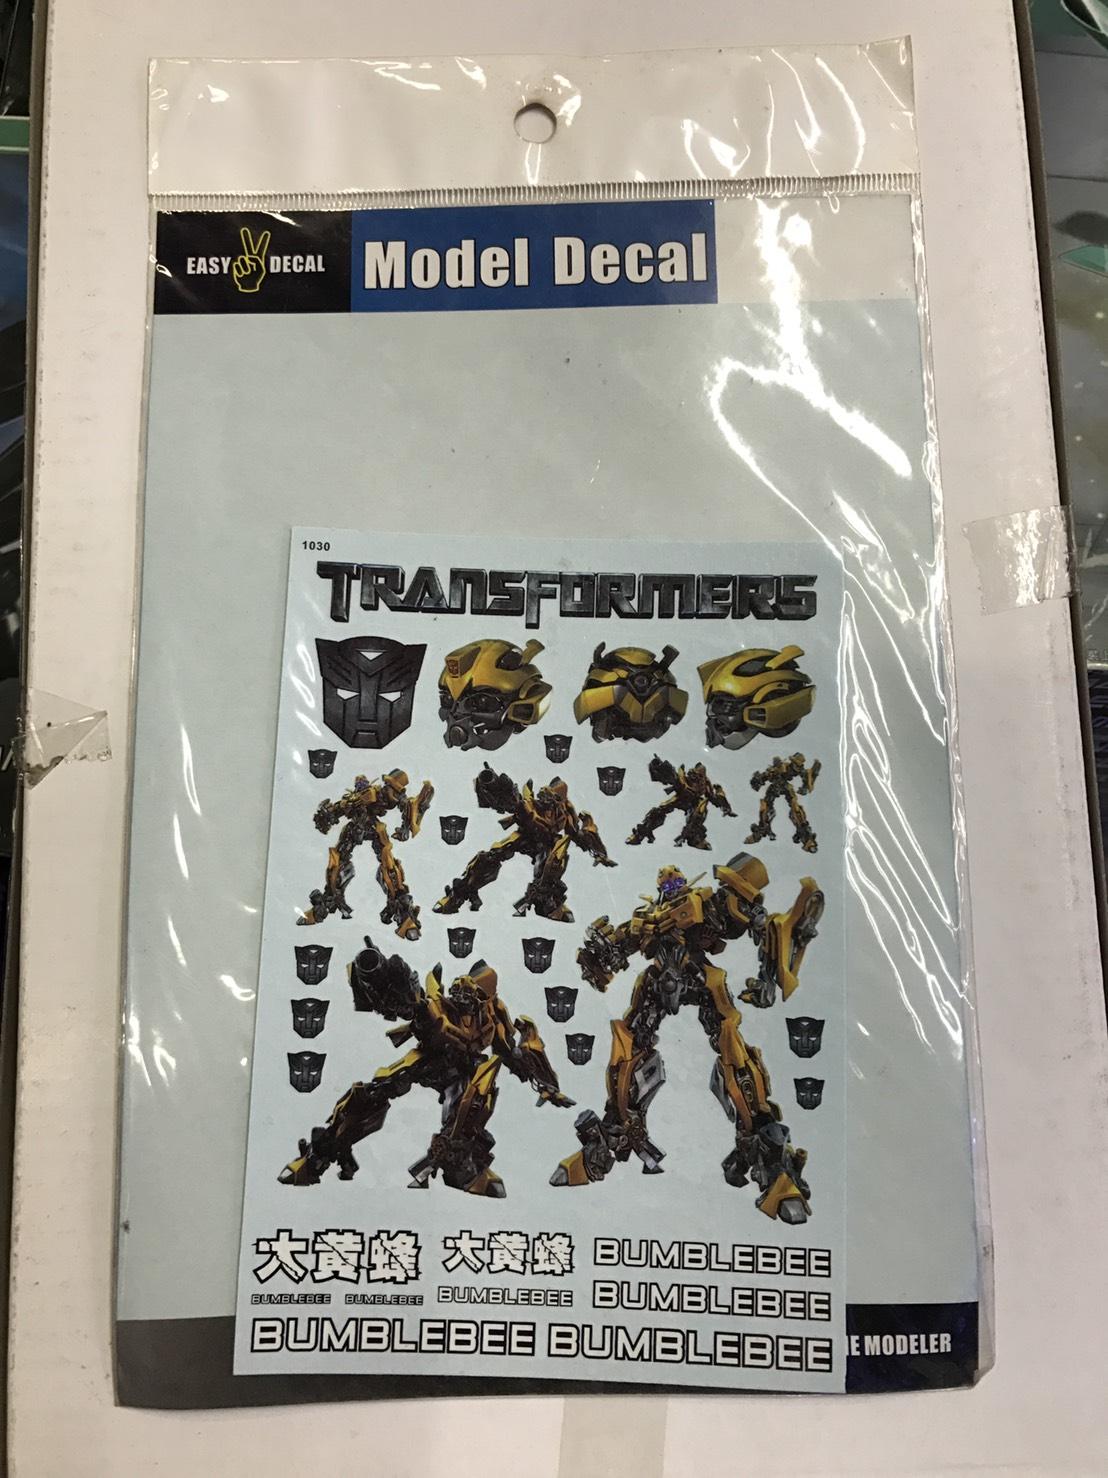 Model Decal 1030 (Bumblebee)